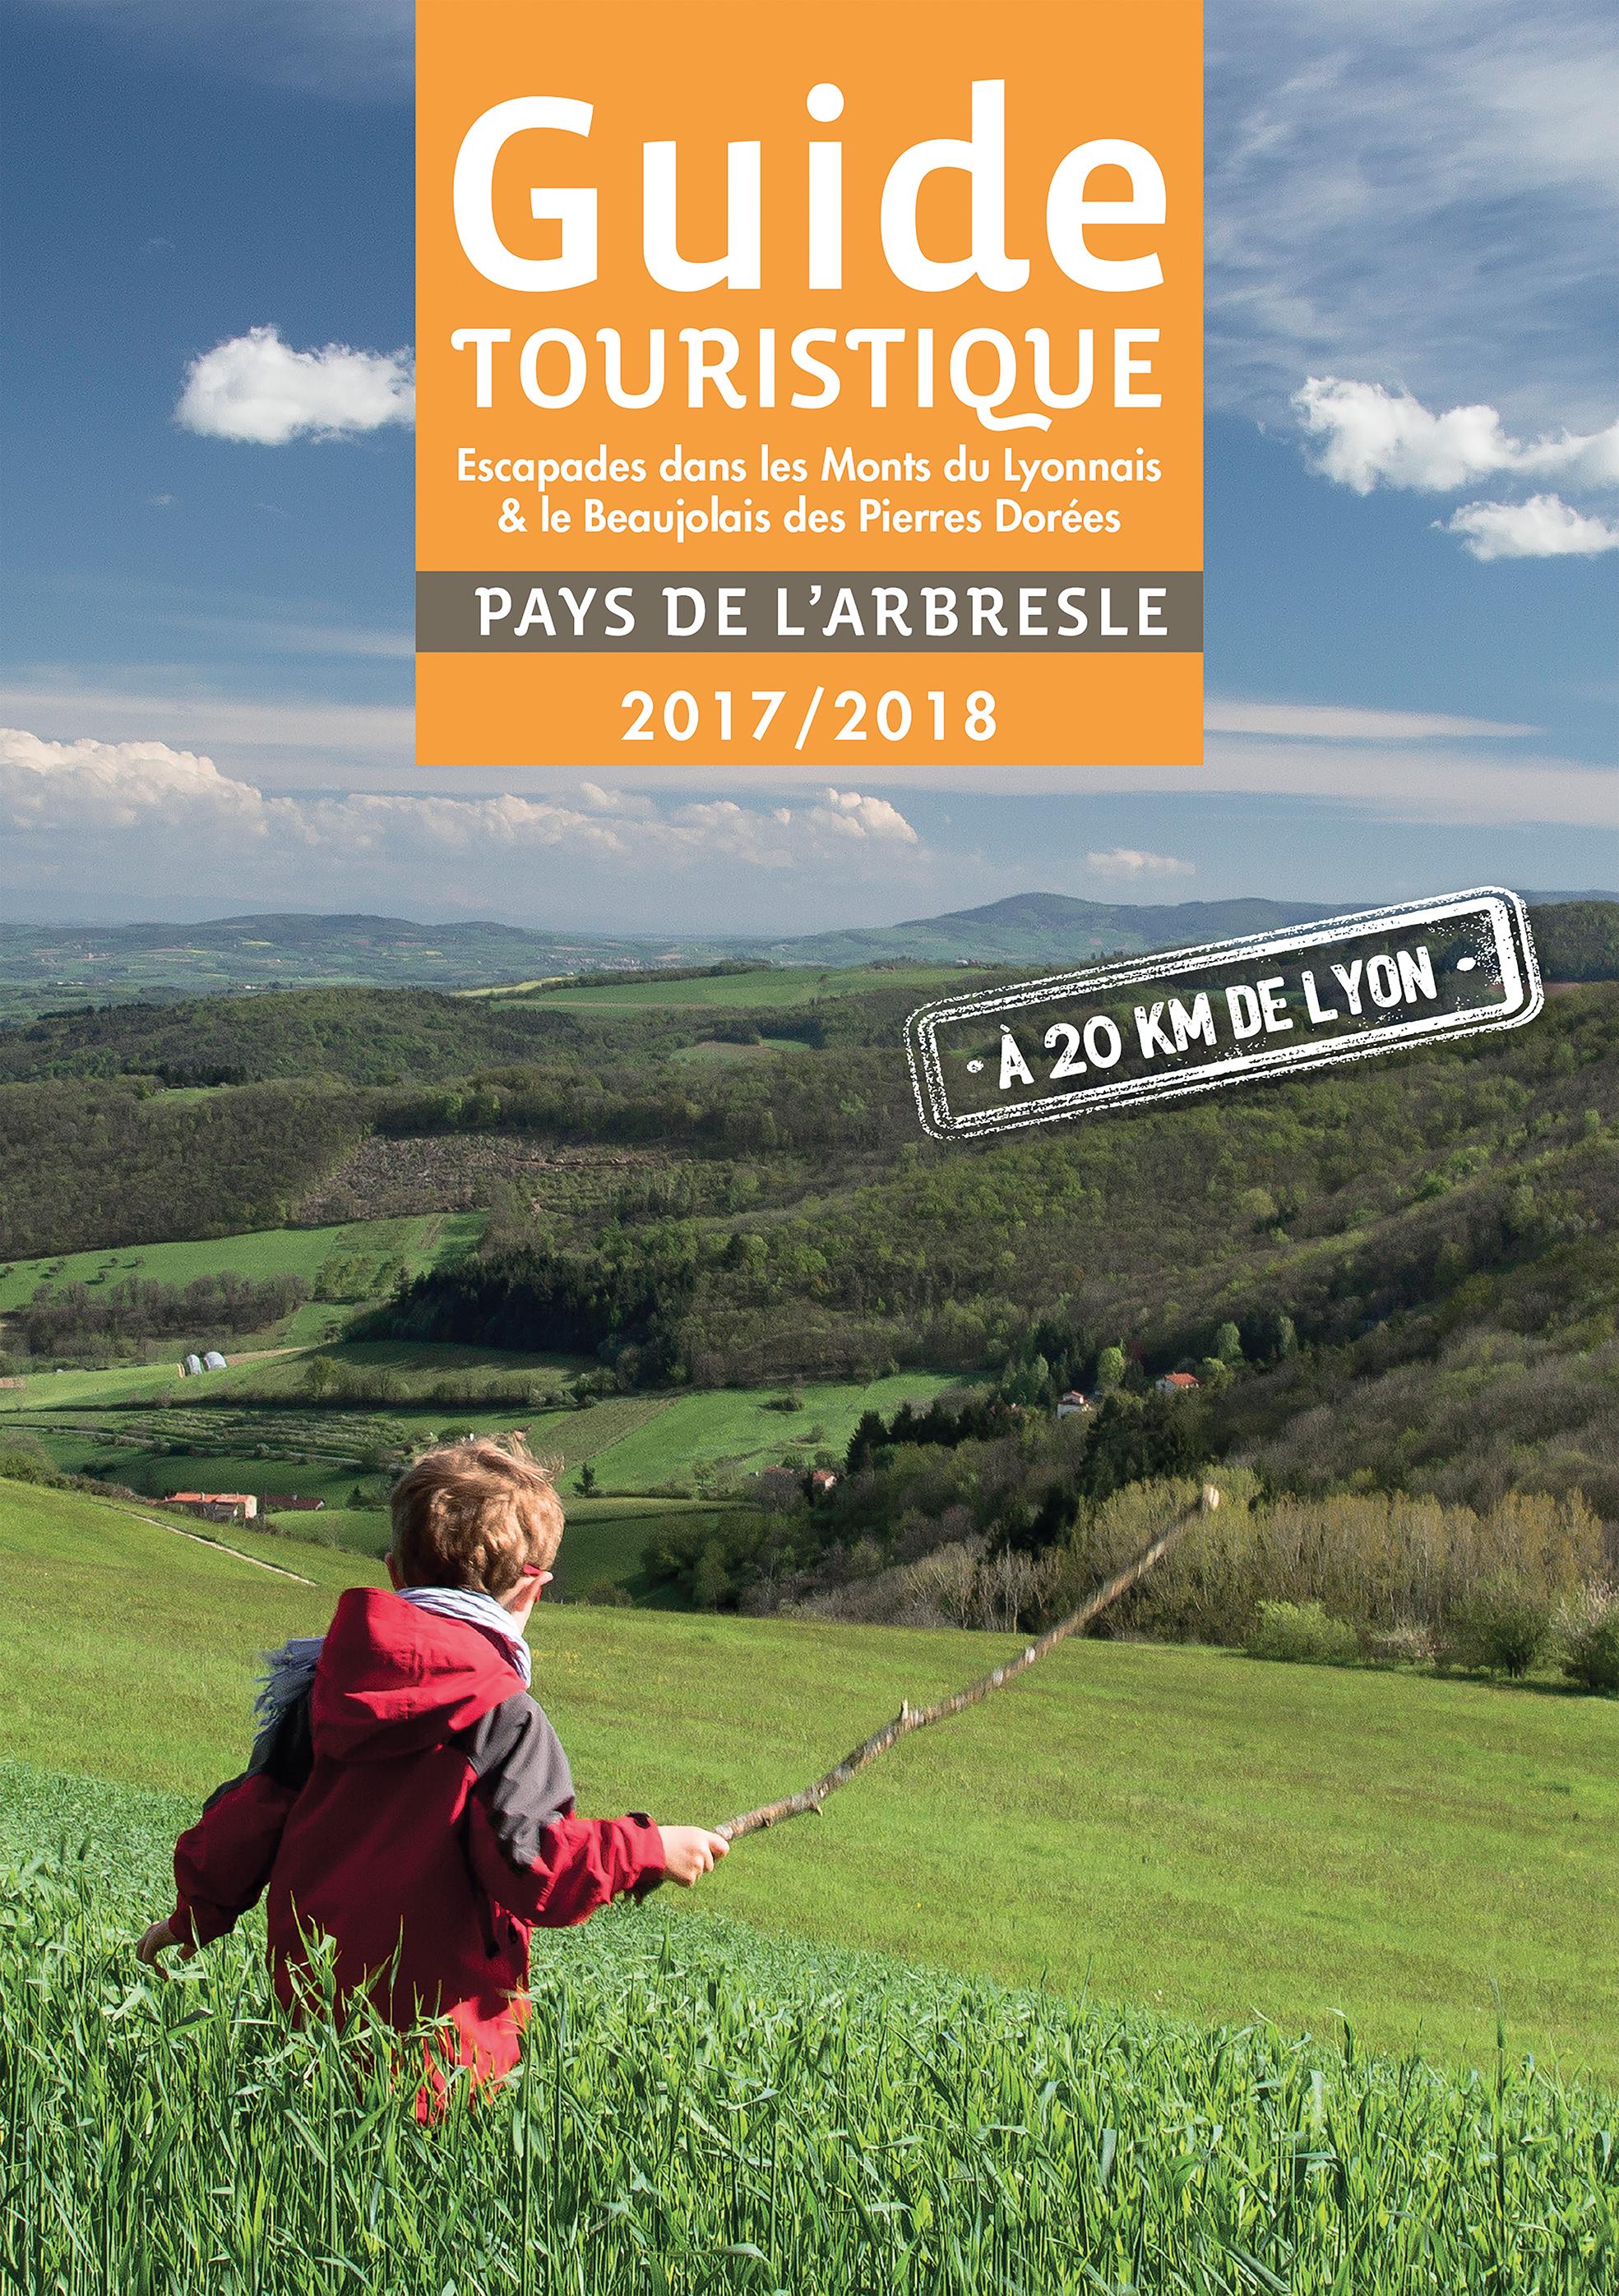 Guide touristique CCPA